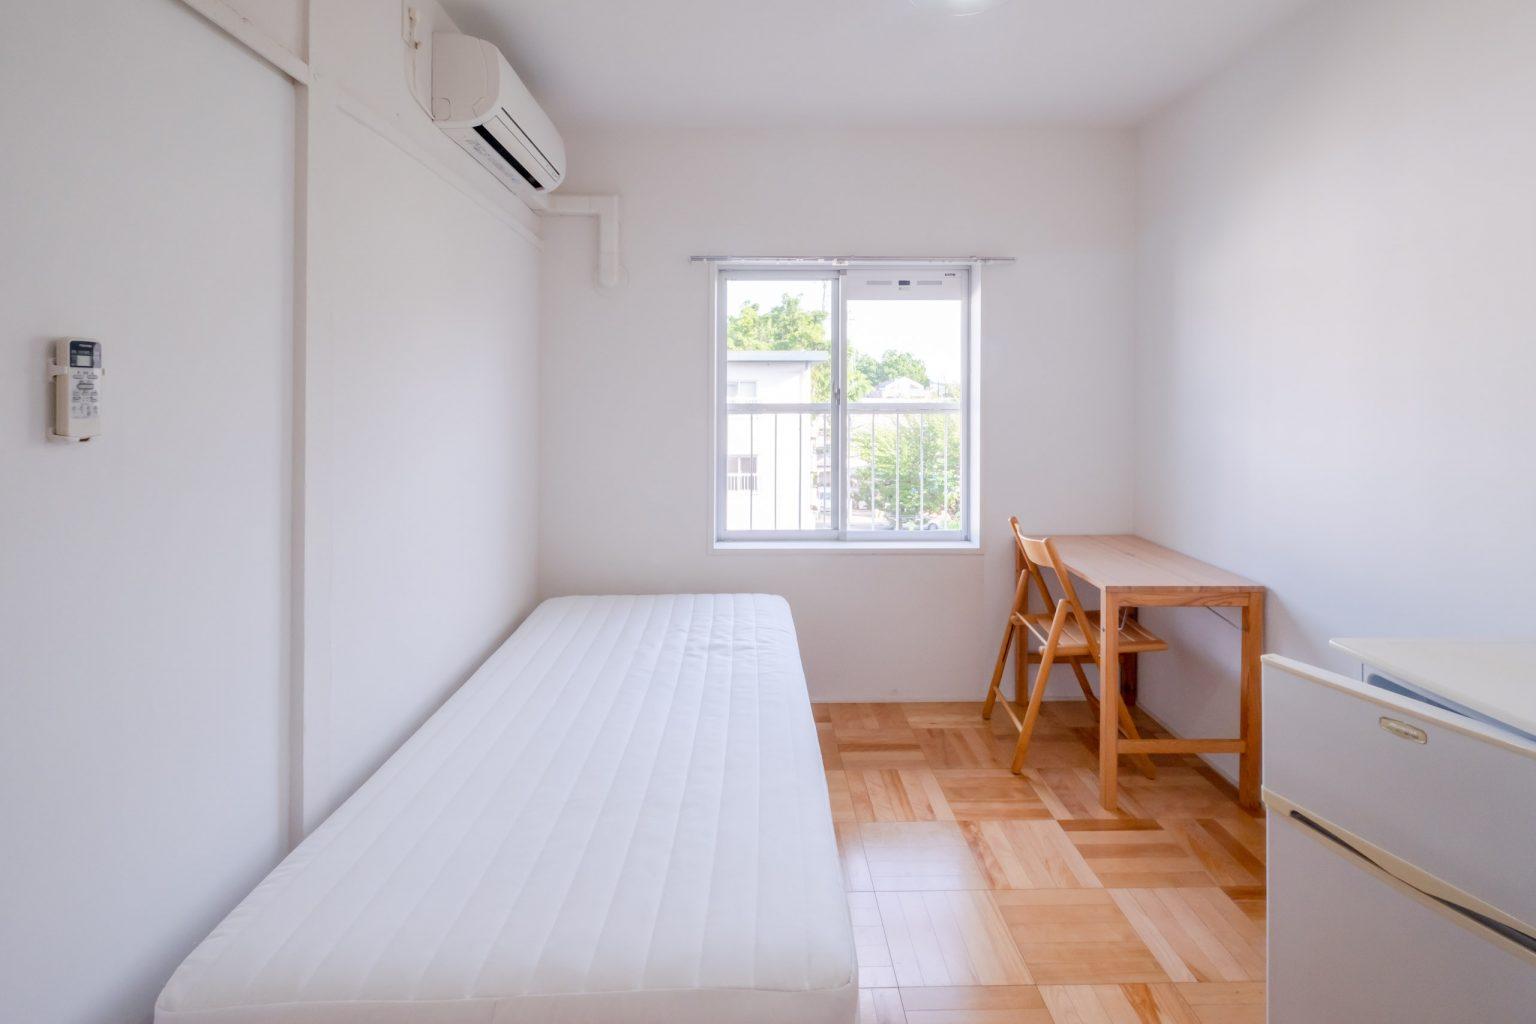 TamaTokiwa-so Sharehouse Complex